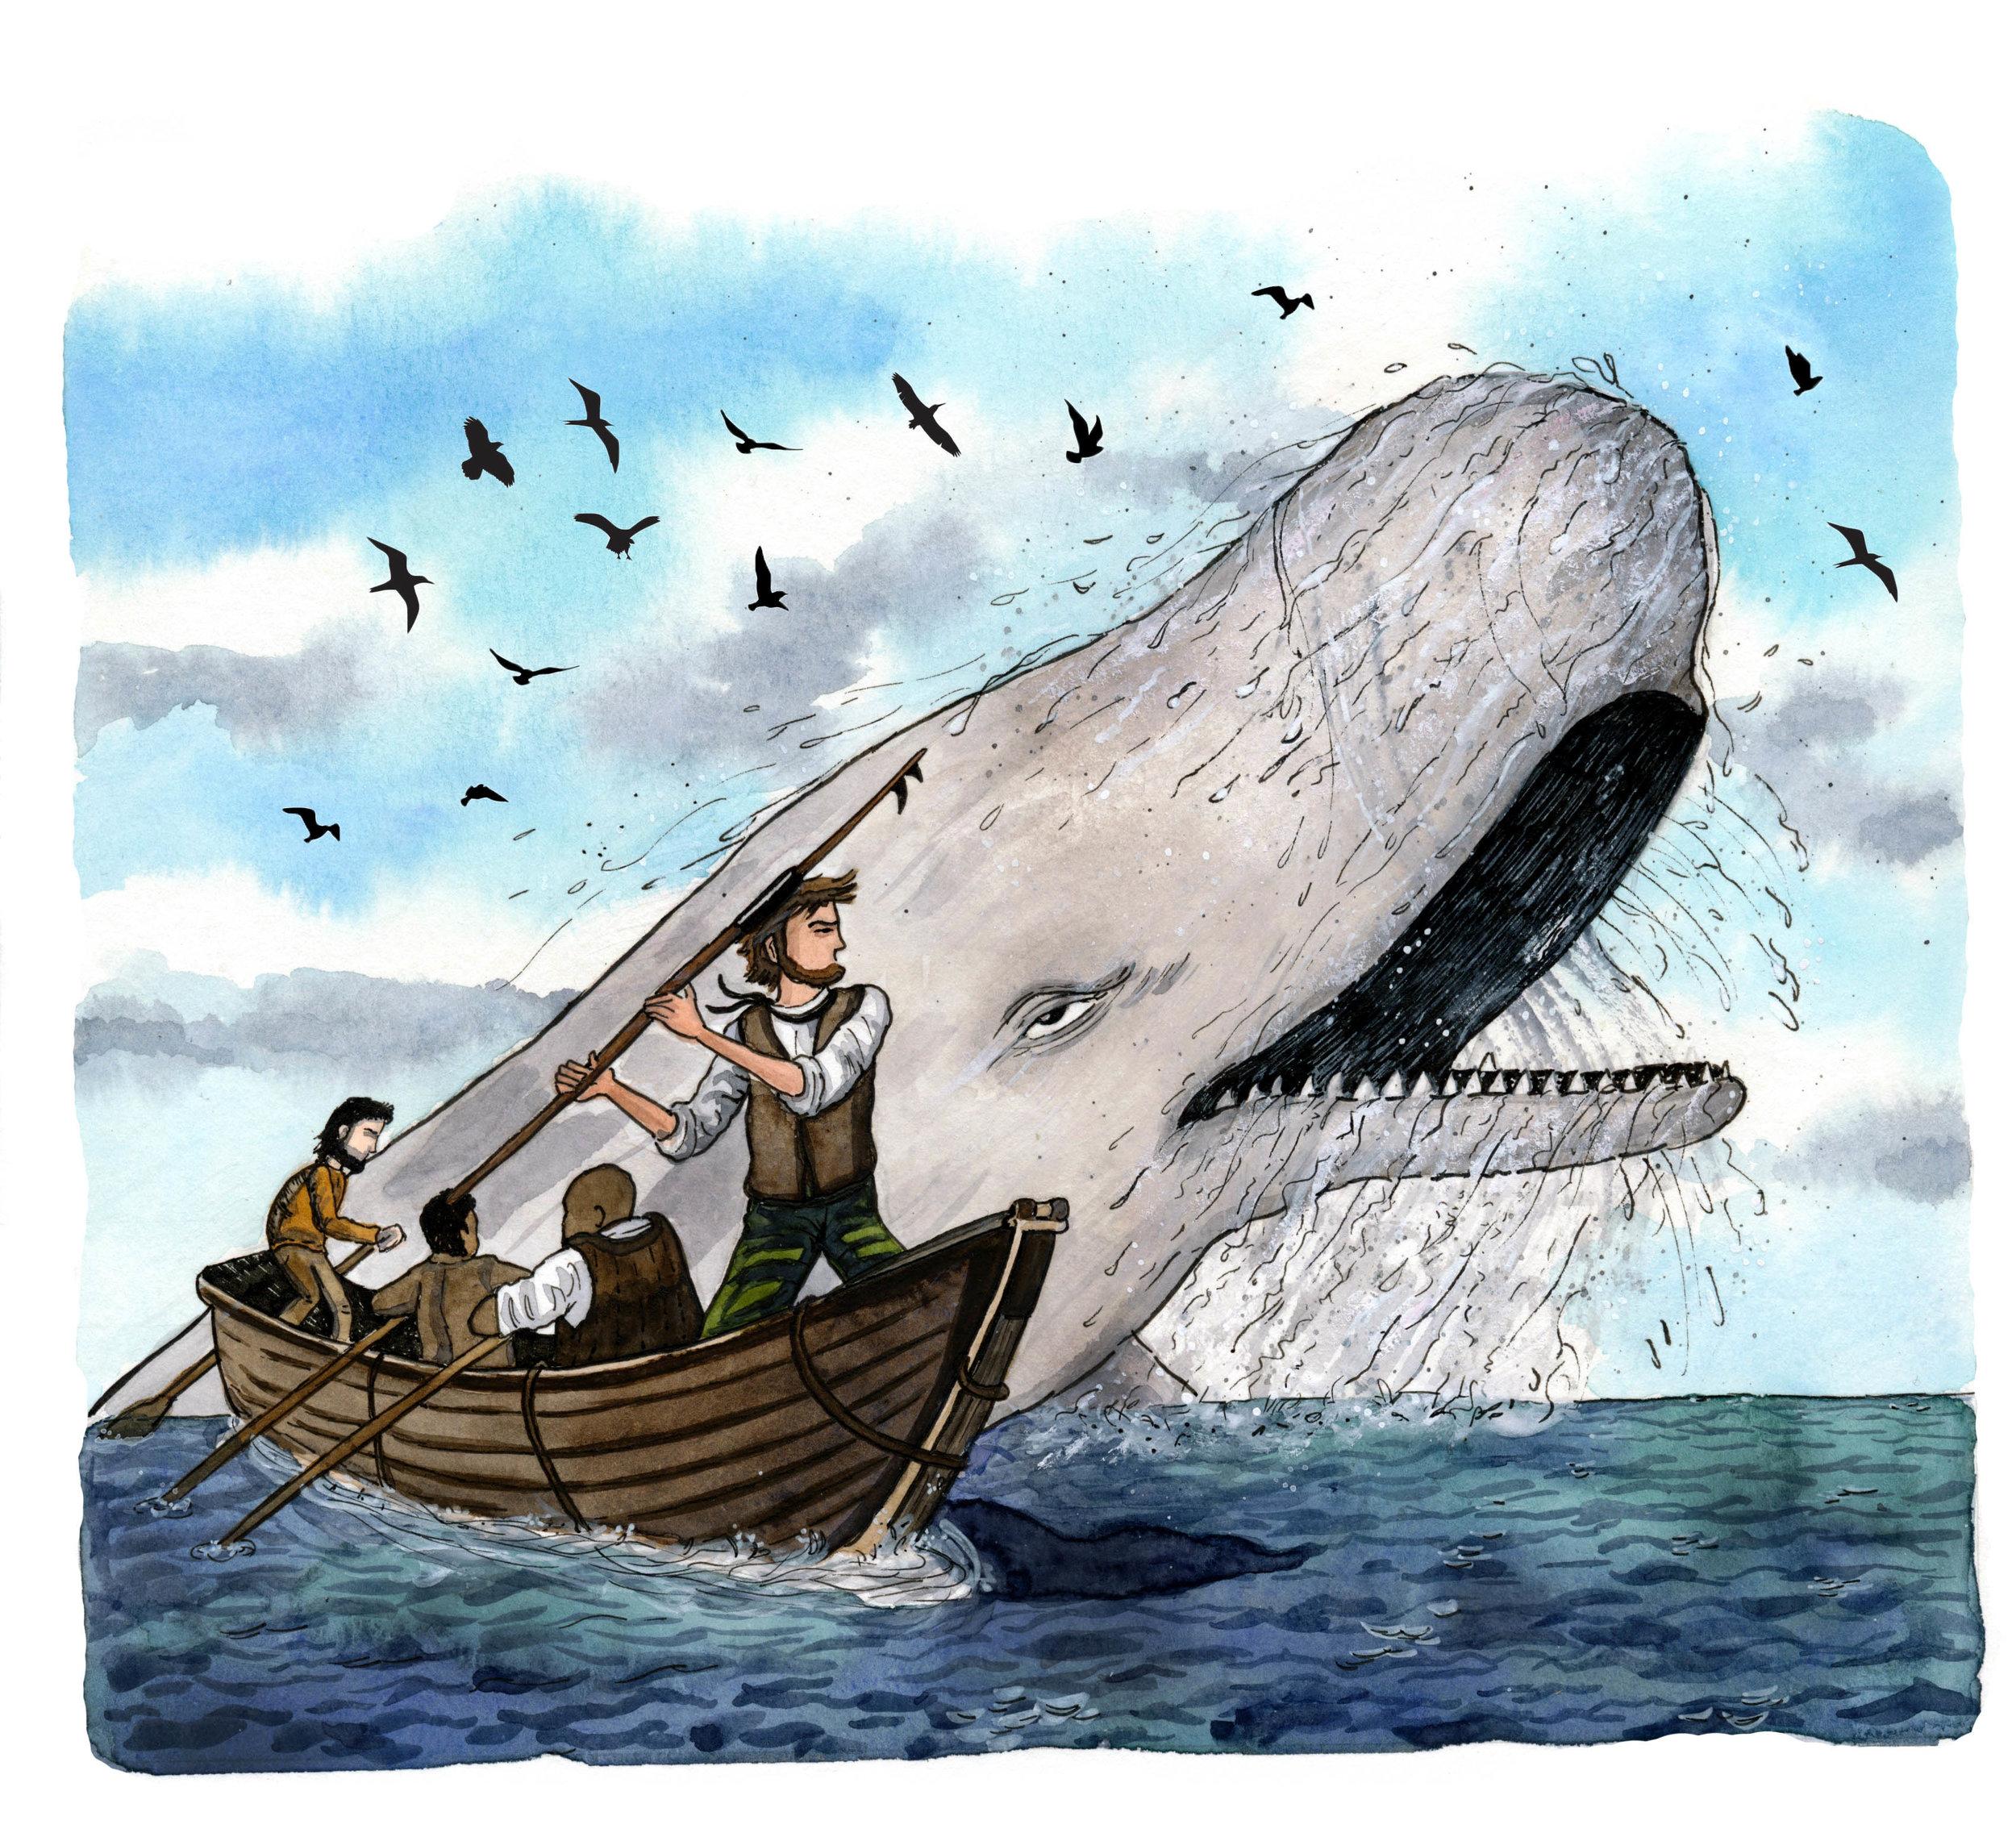 Moby_Dick2_web.jpg